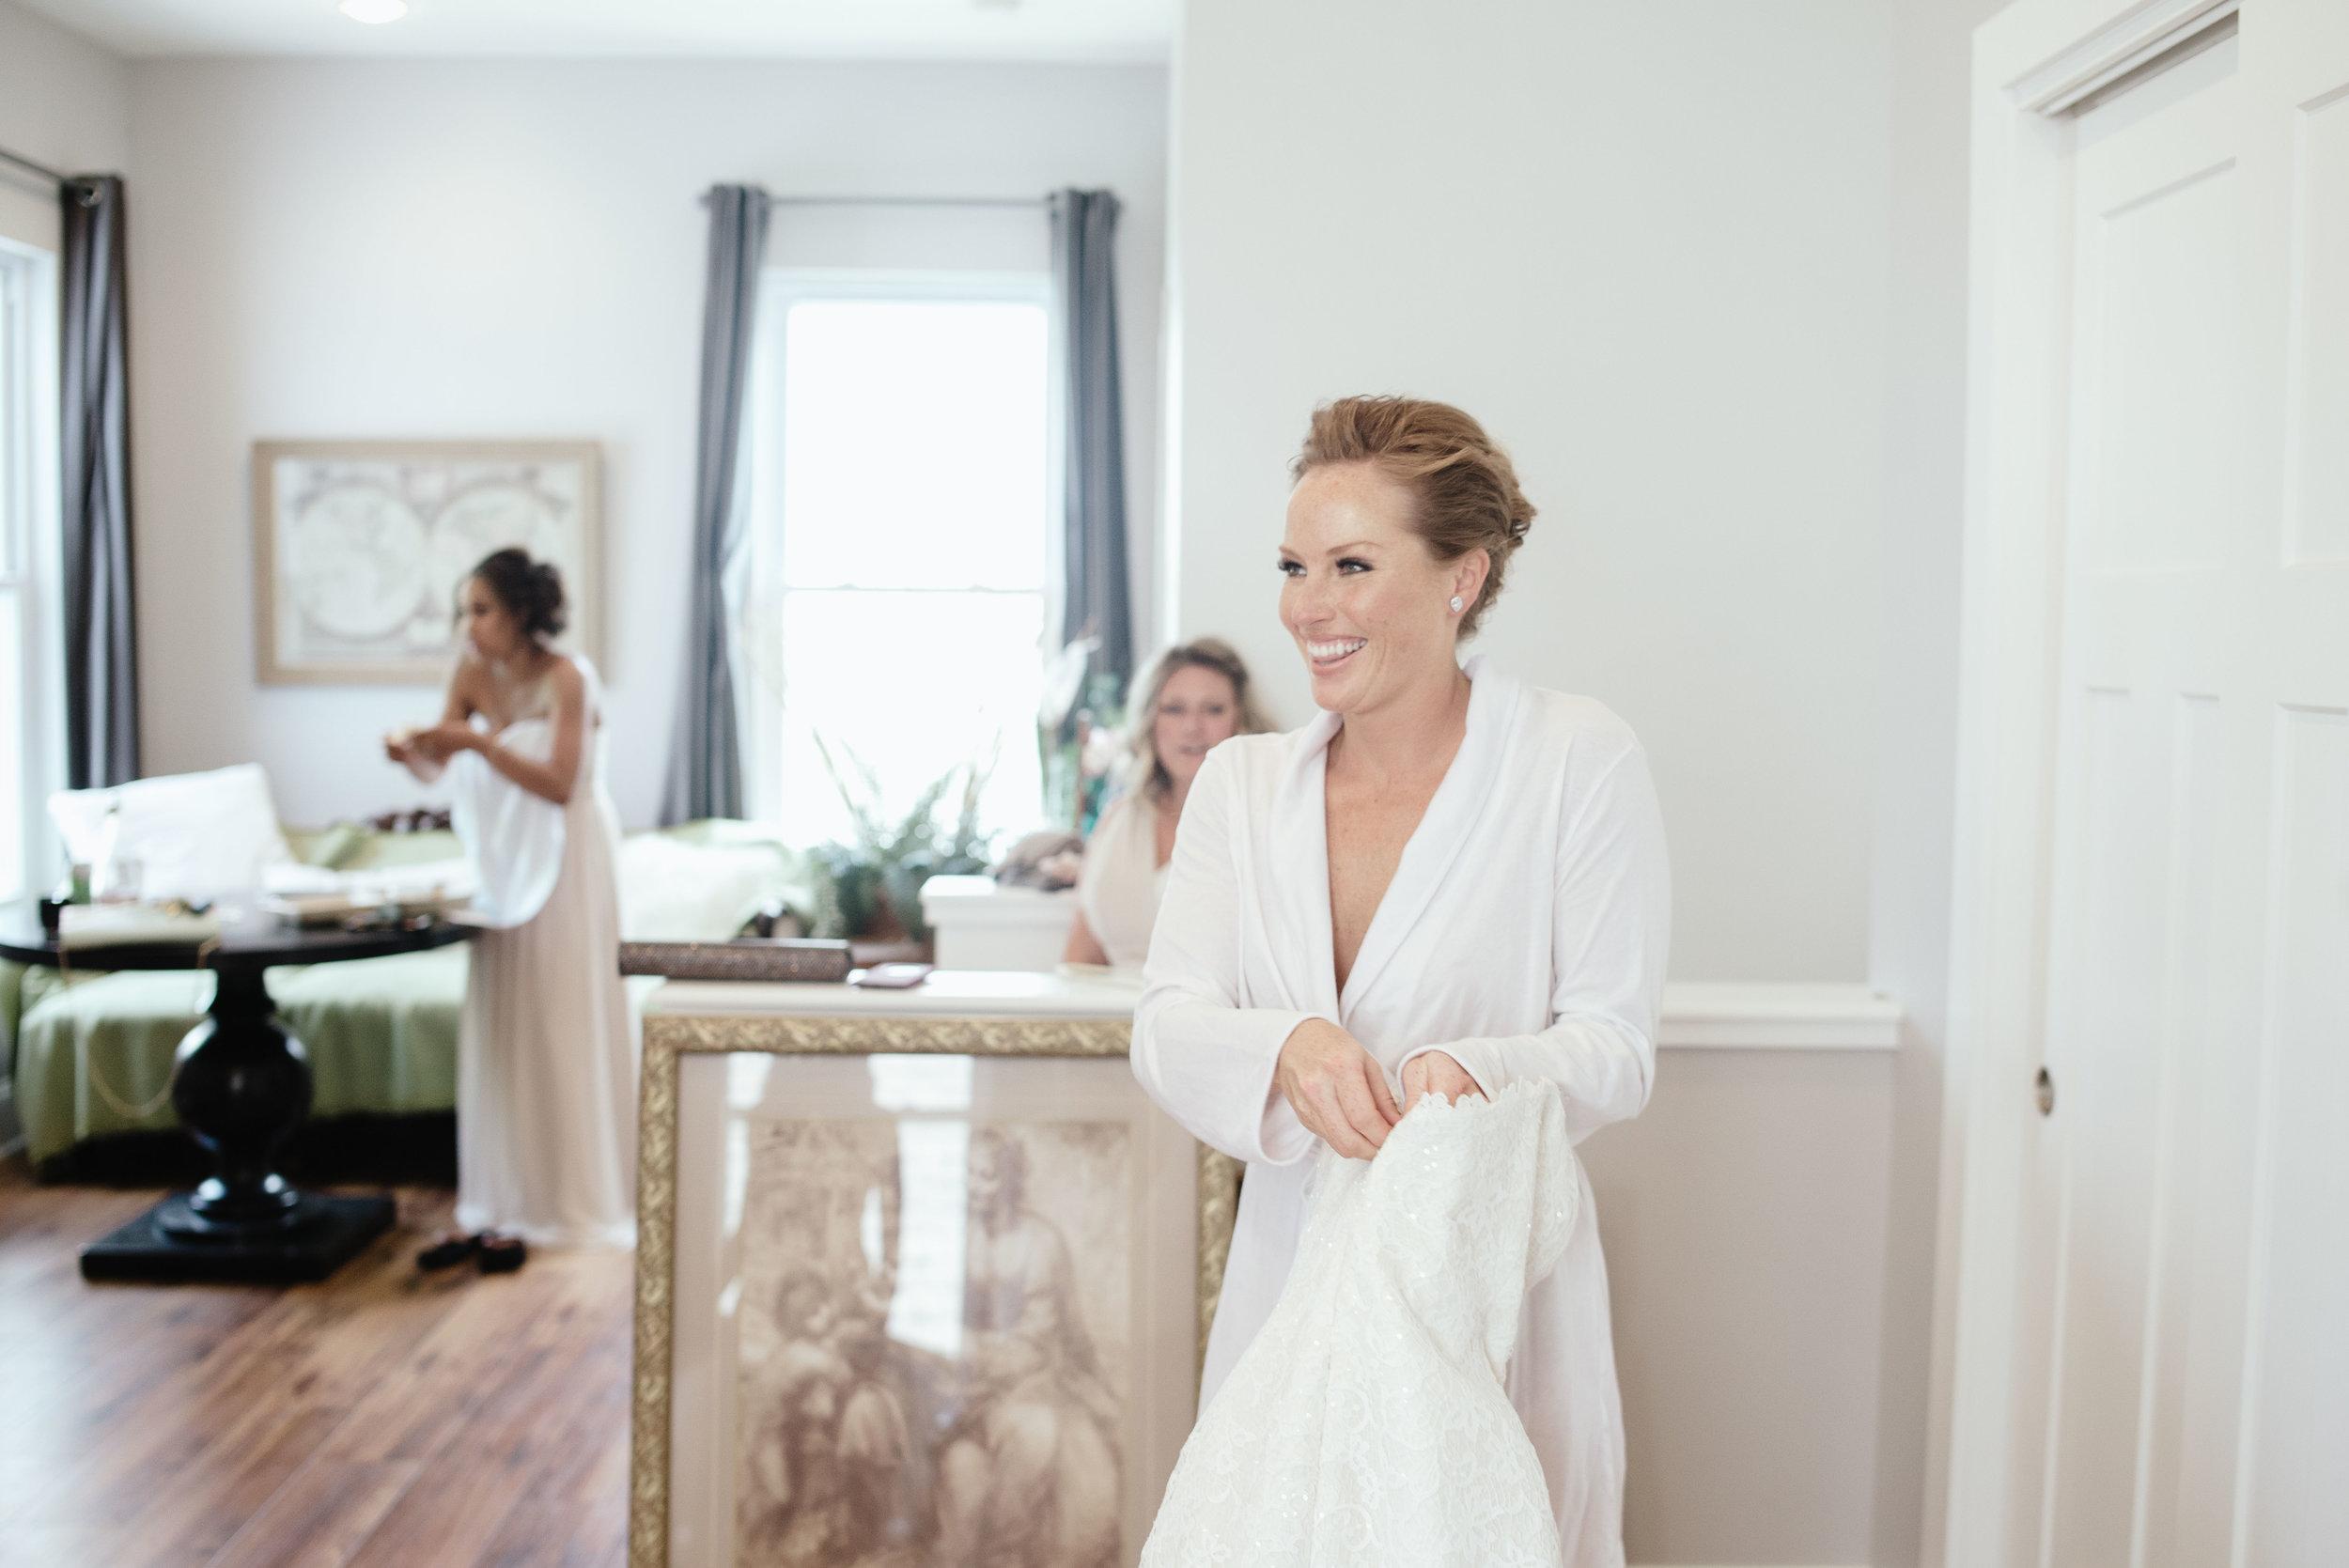 Mina-Steve-Blog-Indianapolis-Wedding-51.jpg